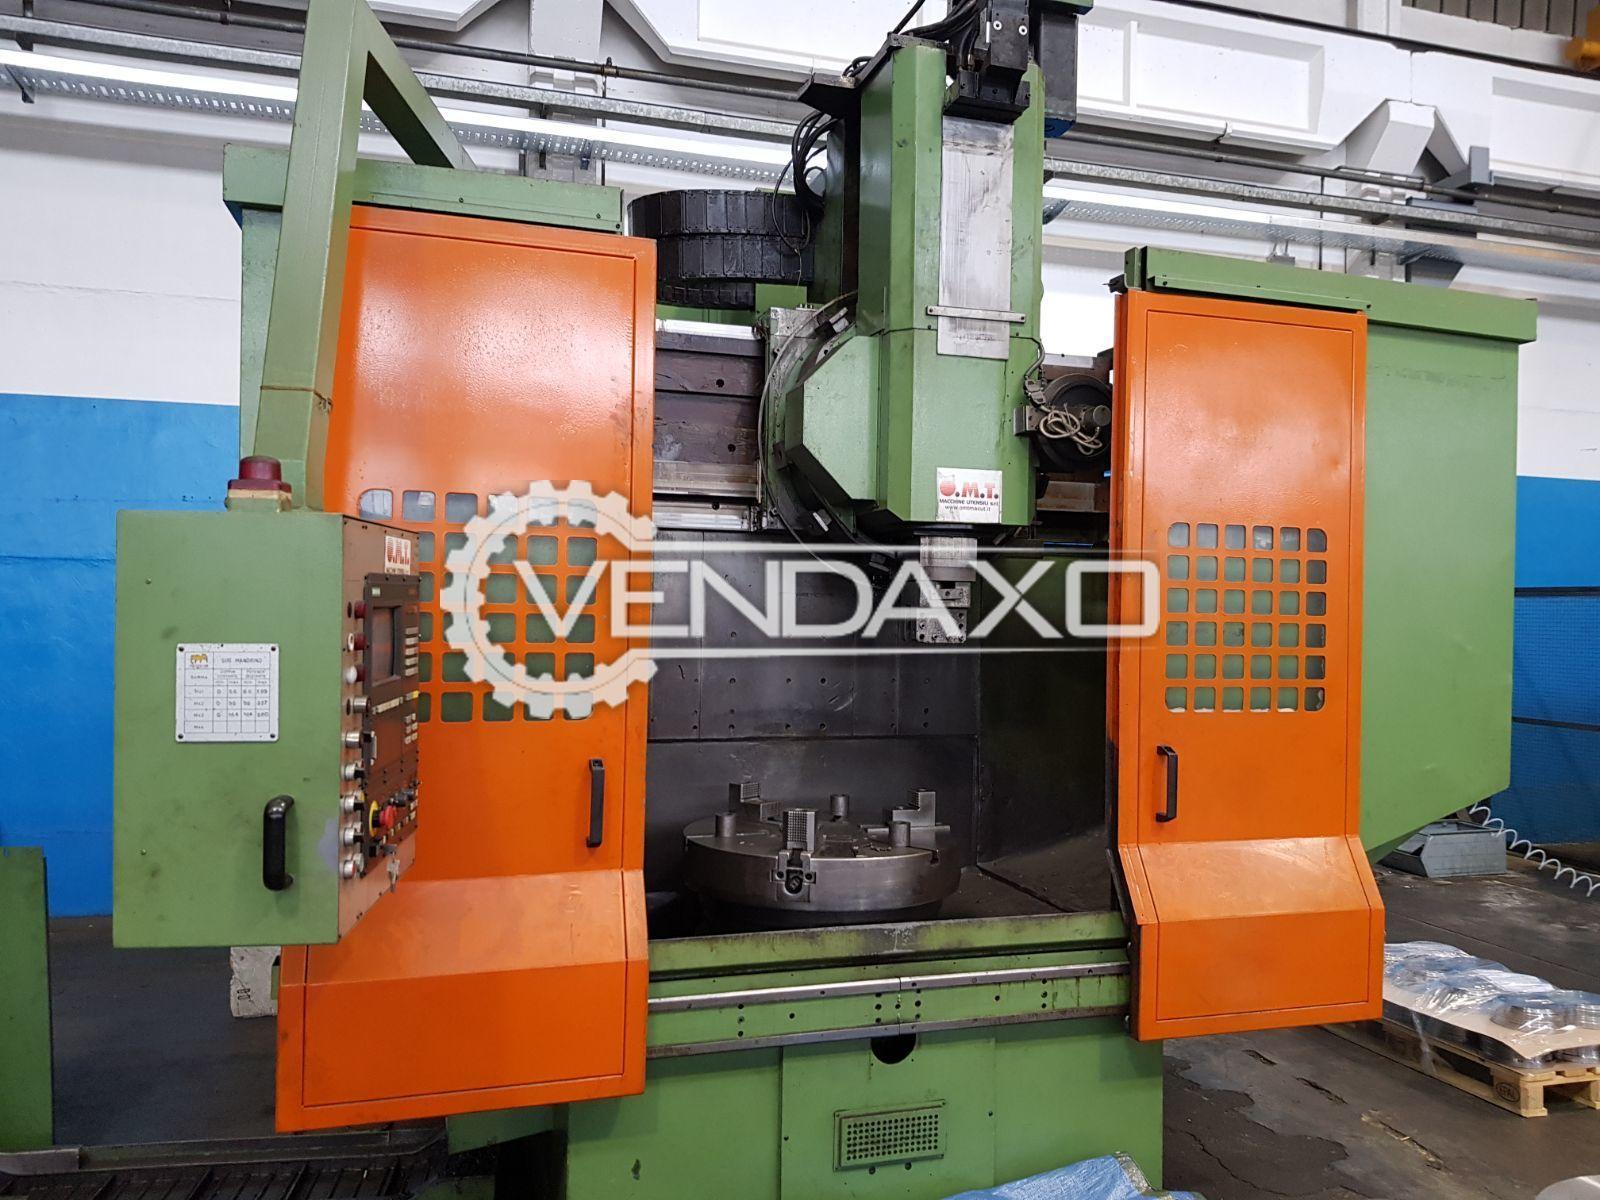 OMT CNC Vertical Machining Center